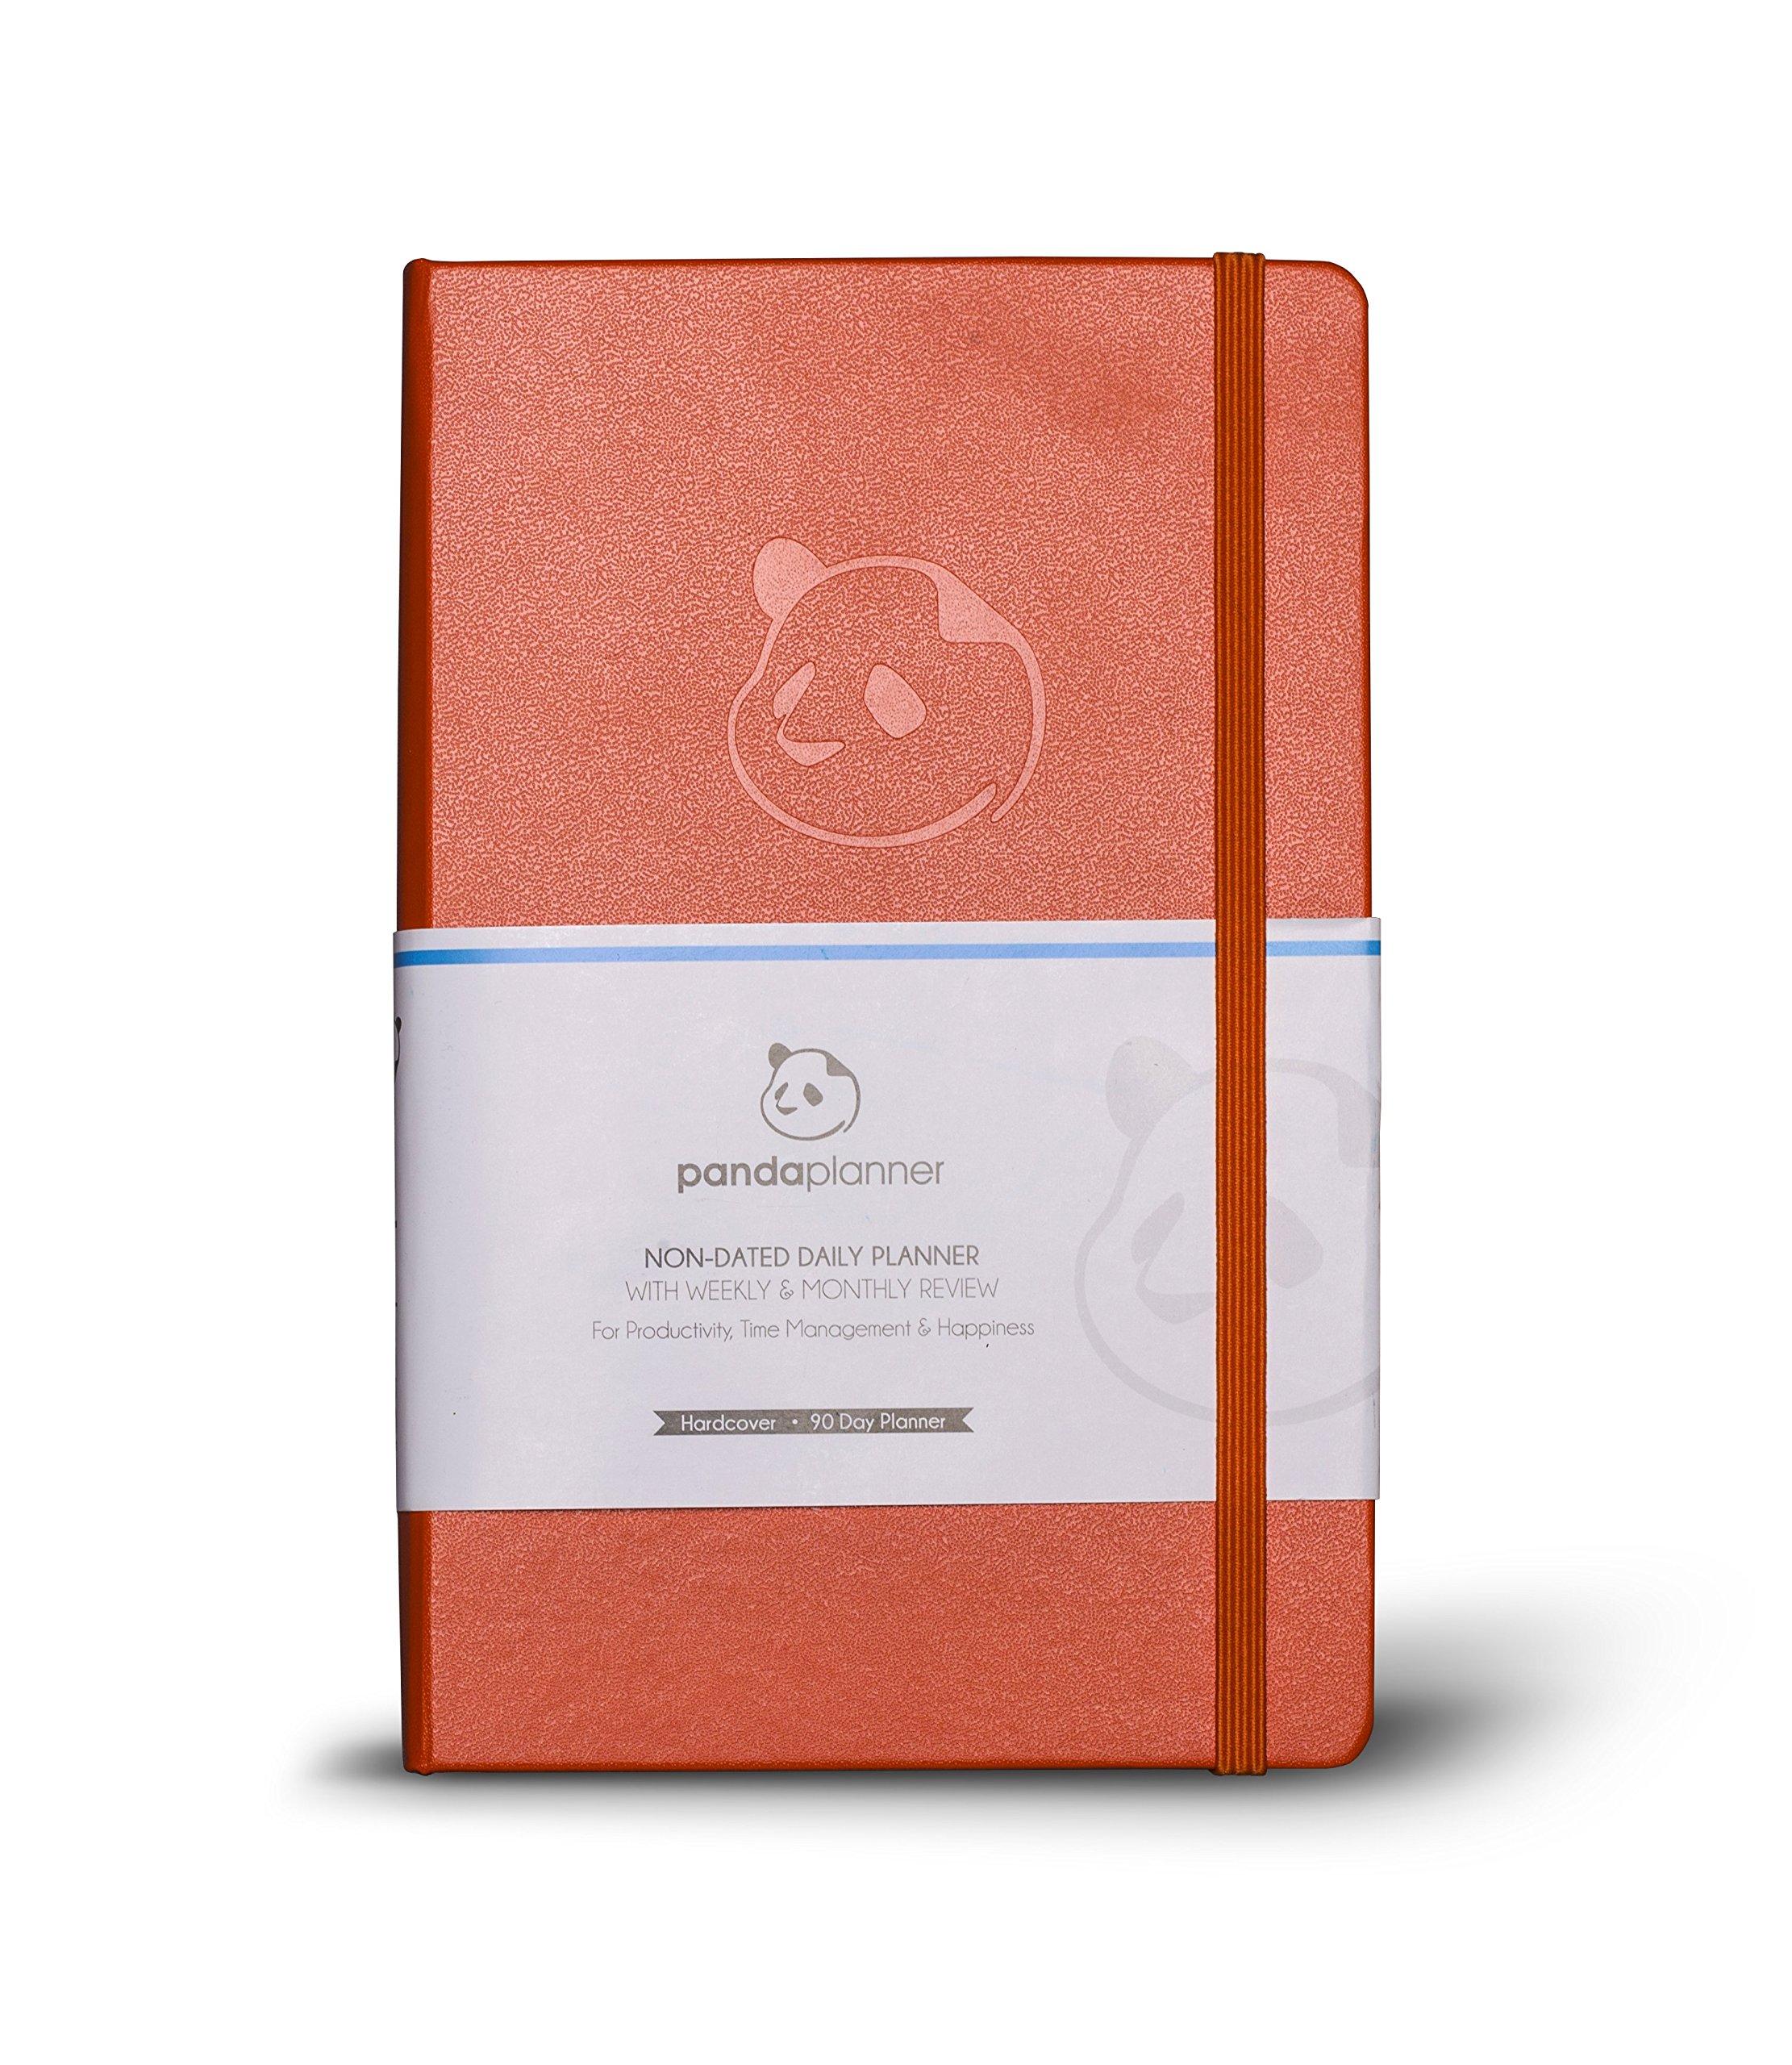 panda planner daily planner calendar and gratitude journal to